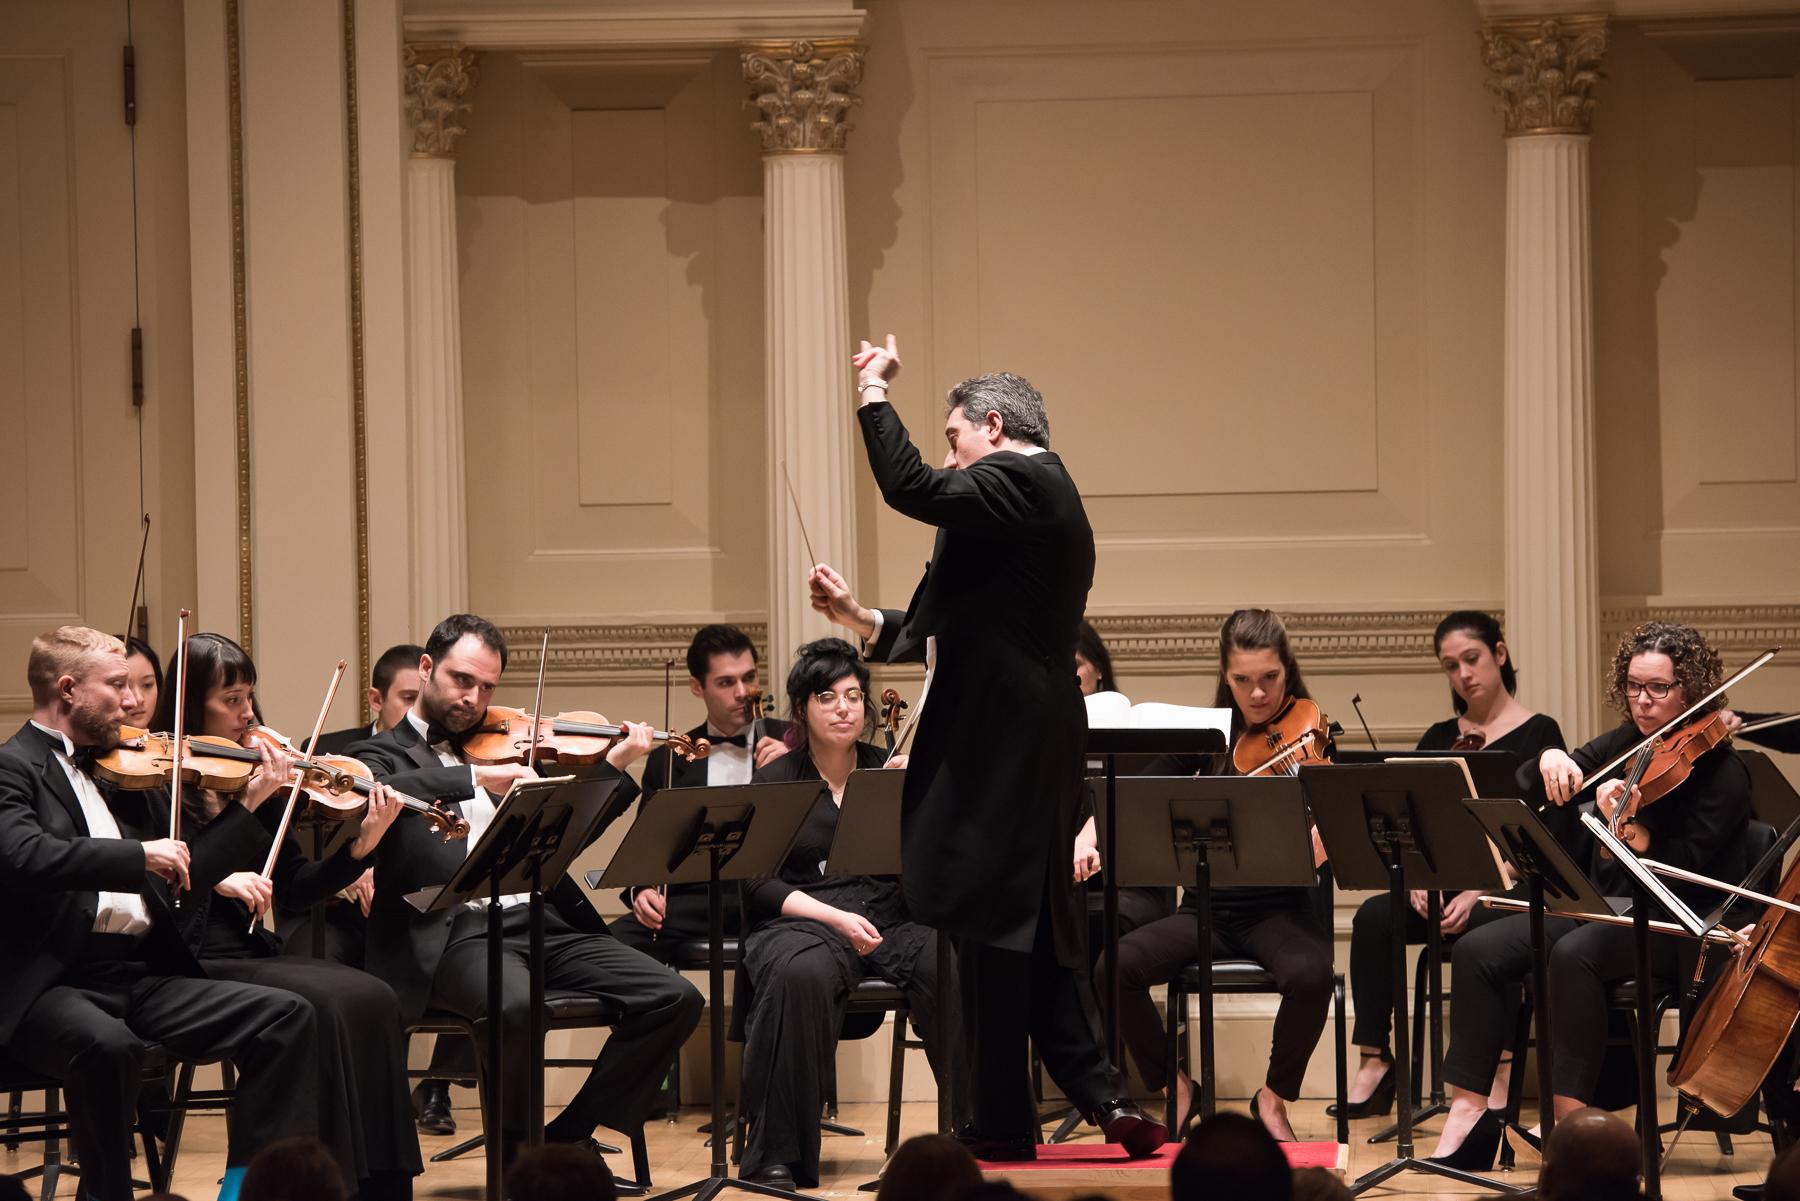 Salvatore Di Vittorio, conductor, Concert Season – Strauss, Vaughan Williams' DI VITTORIO, Preludio Sentimentale [World Premiere] VAUGHAN WILLIAMS, Fantasia on a Theme by Thomas Tallis Intermission (20 minutes) R. STRAUSS, Metamorphosen